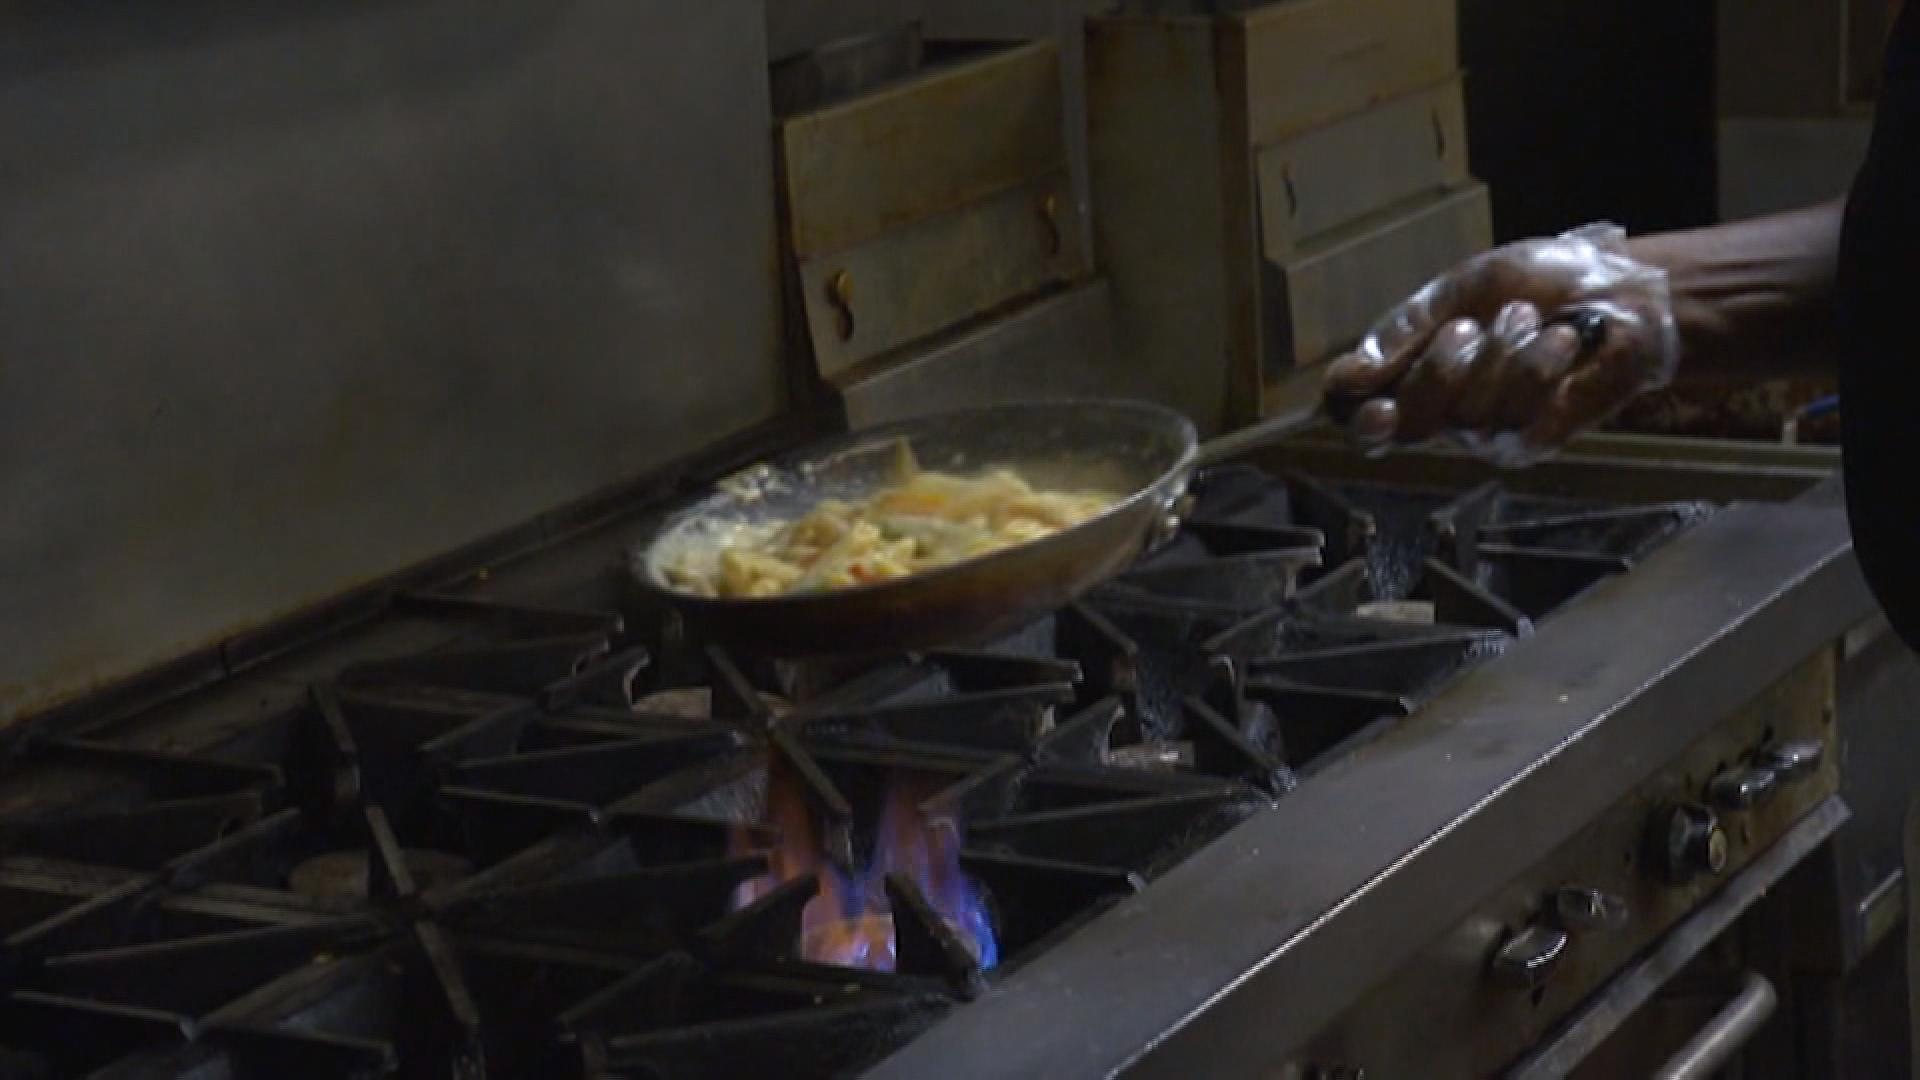 A chef prepares food.